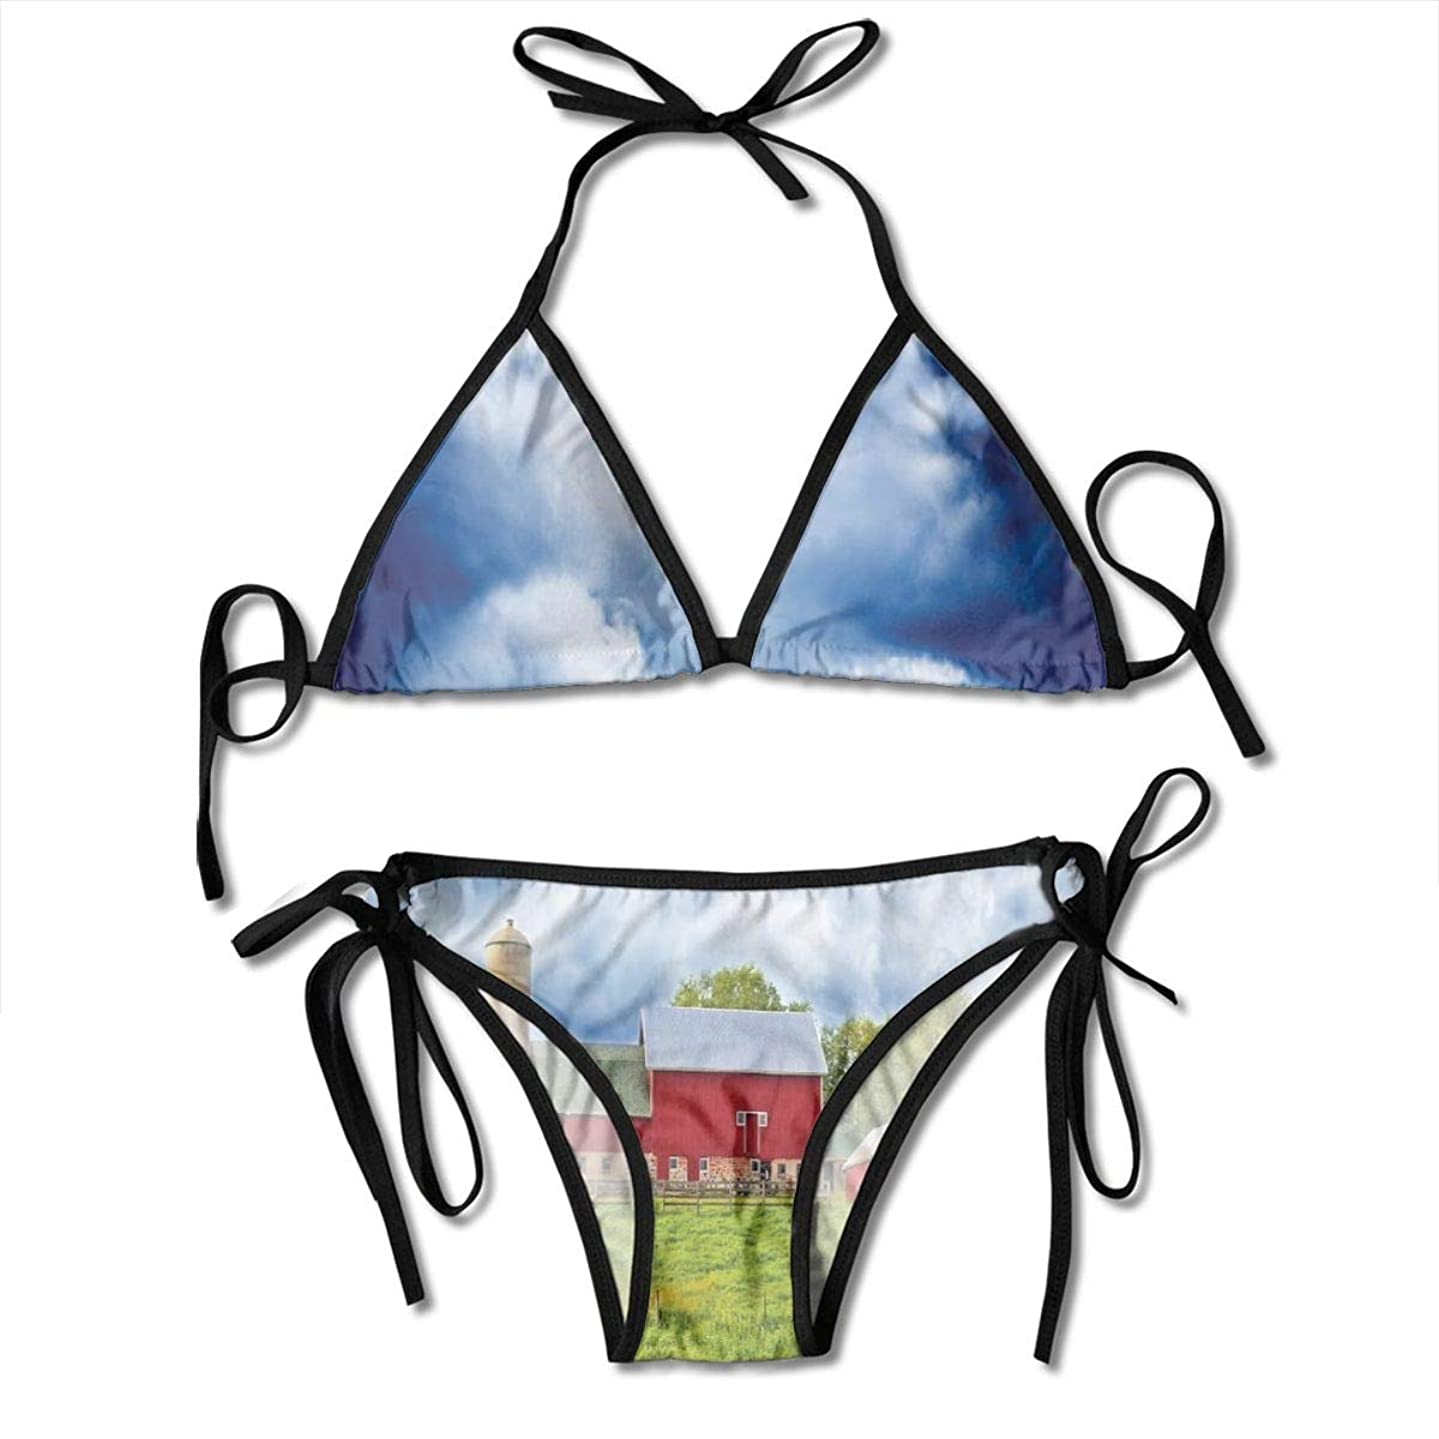 Women's Bikini Set,Festive Celebration Pattern with Vertical Borders Pink Blue Floral Circles,Two Pieces Swimsuit